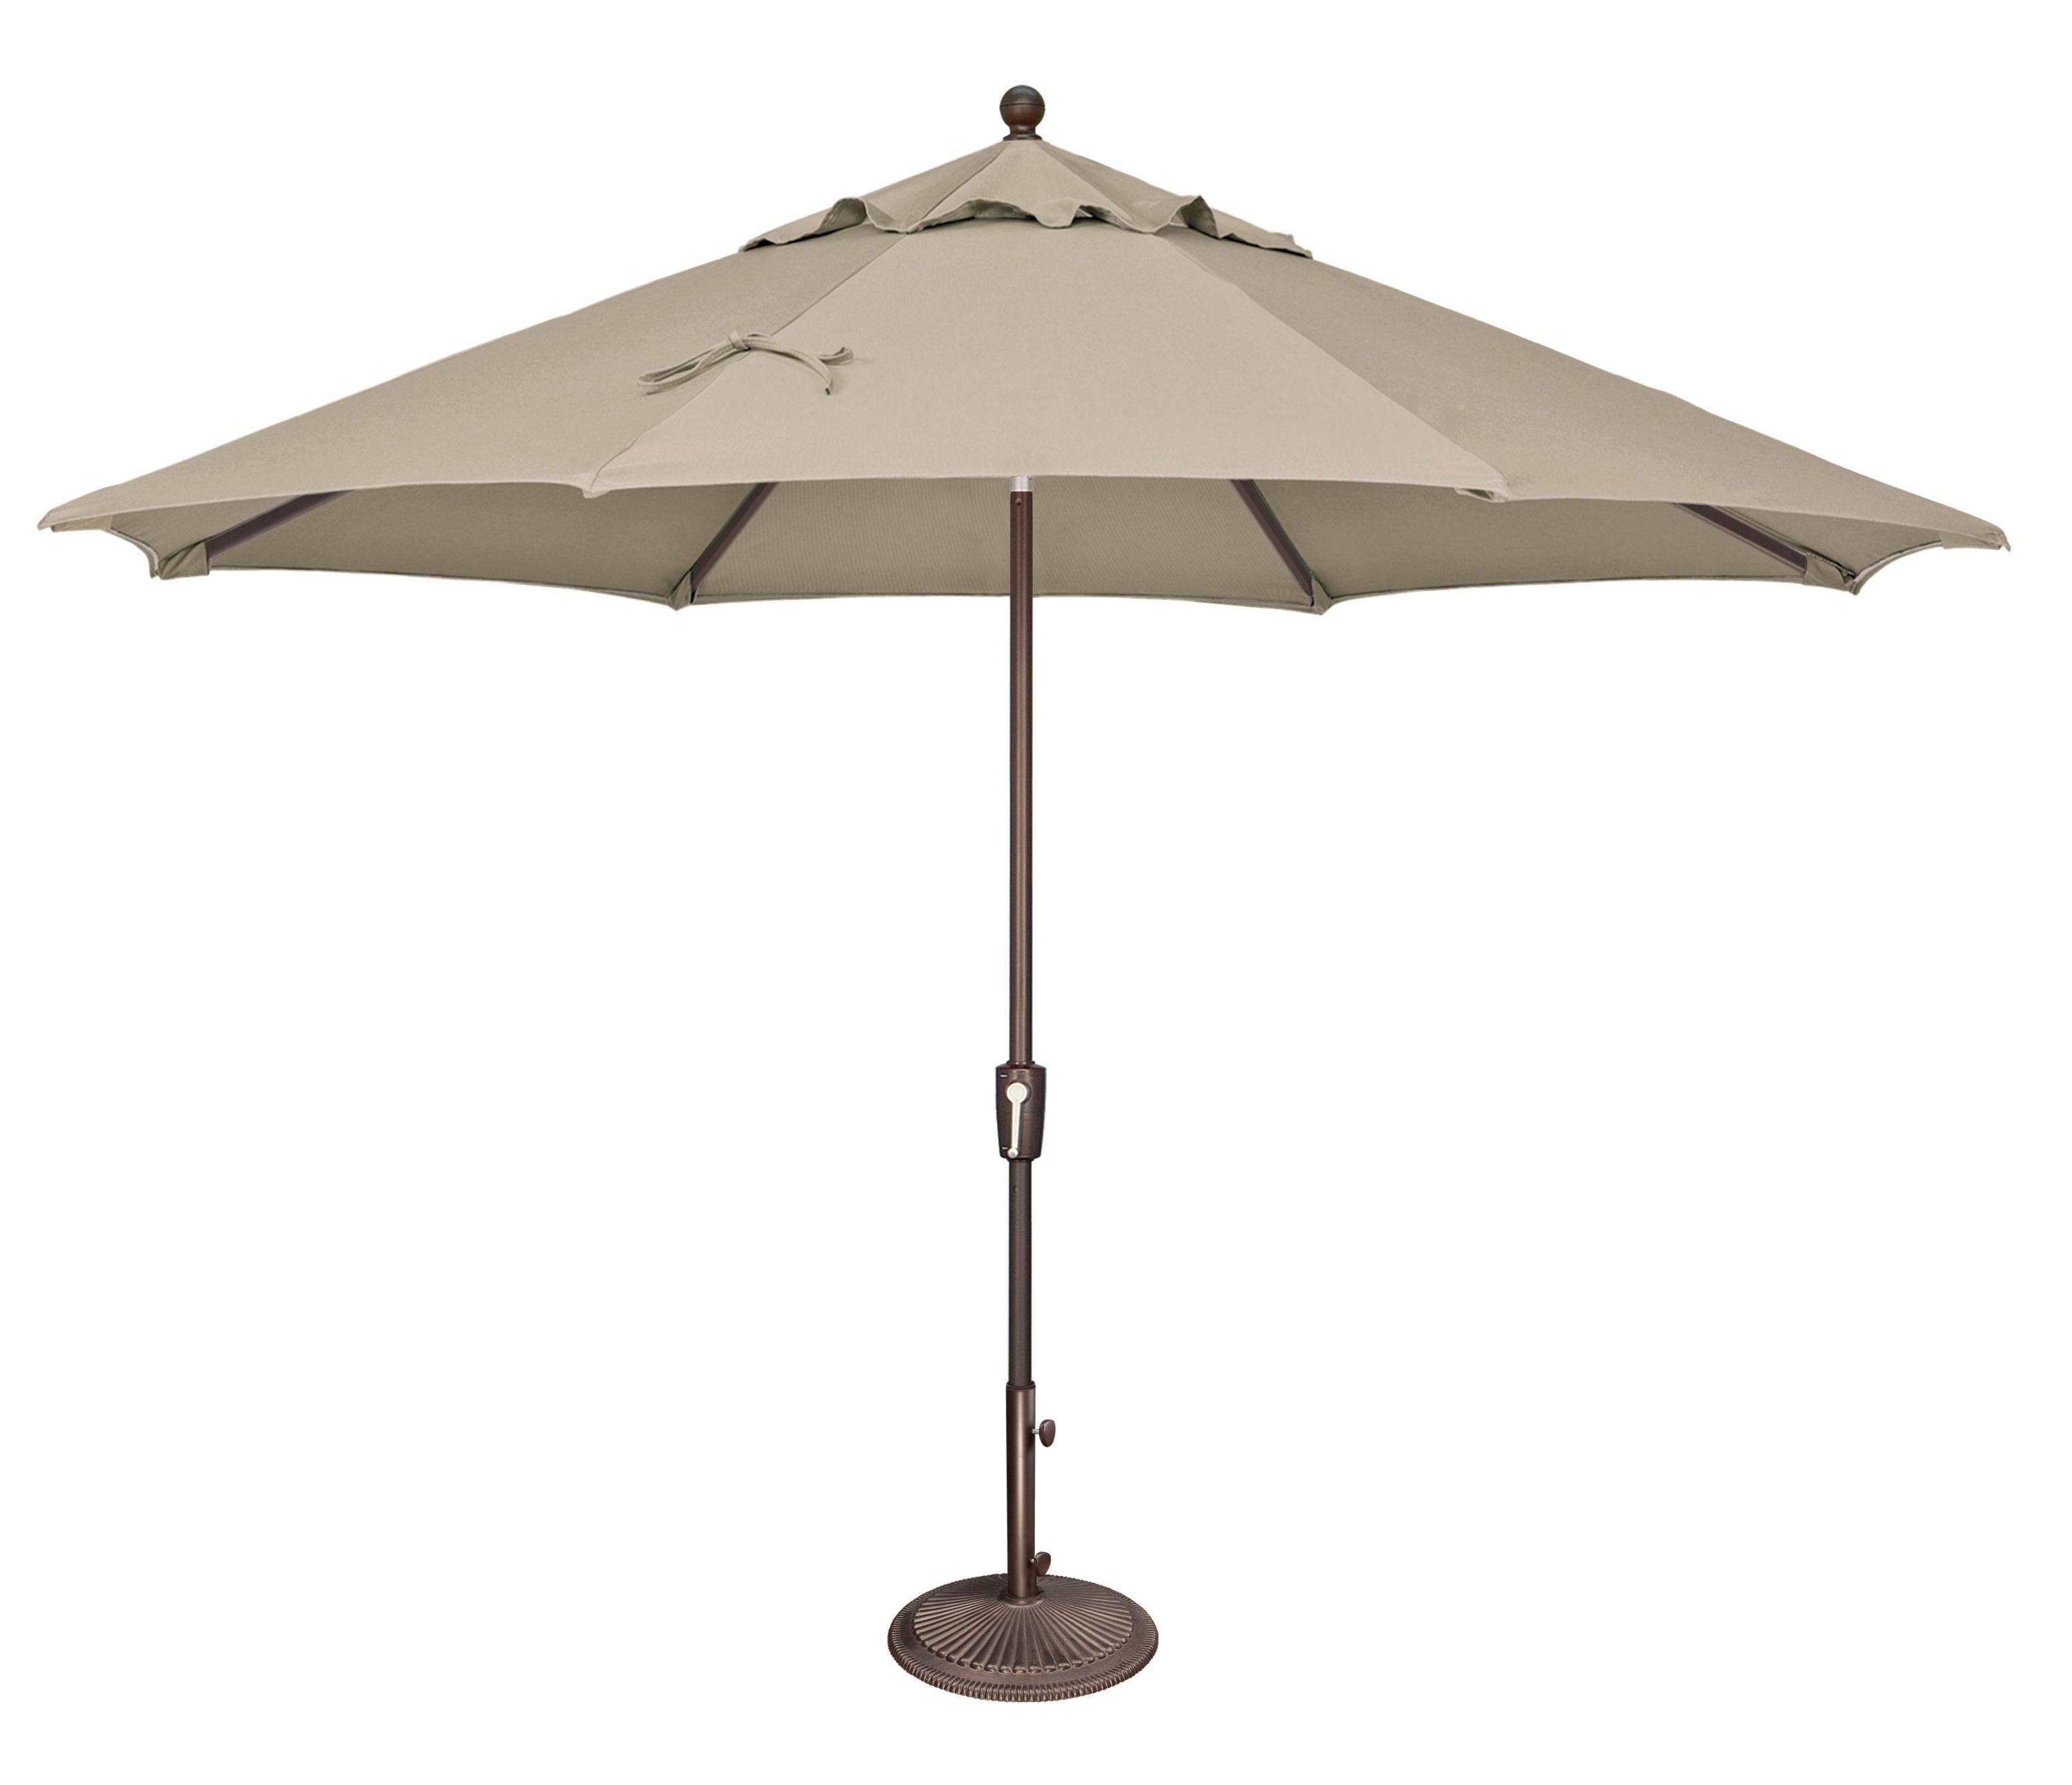 Launceston 11' Market Umbrella With Regard To Trendy Devansh Market Umbrellas (View 16 of 20)